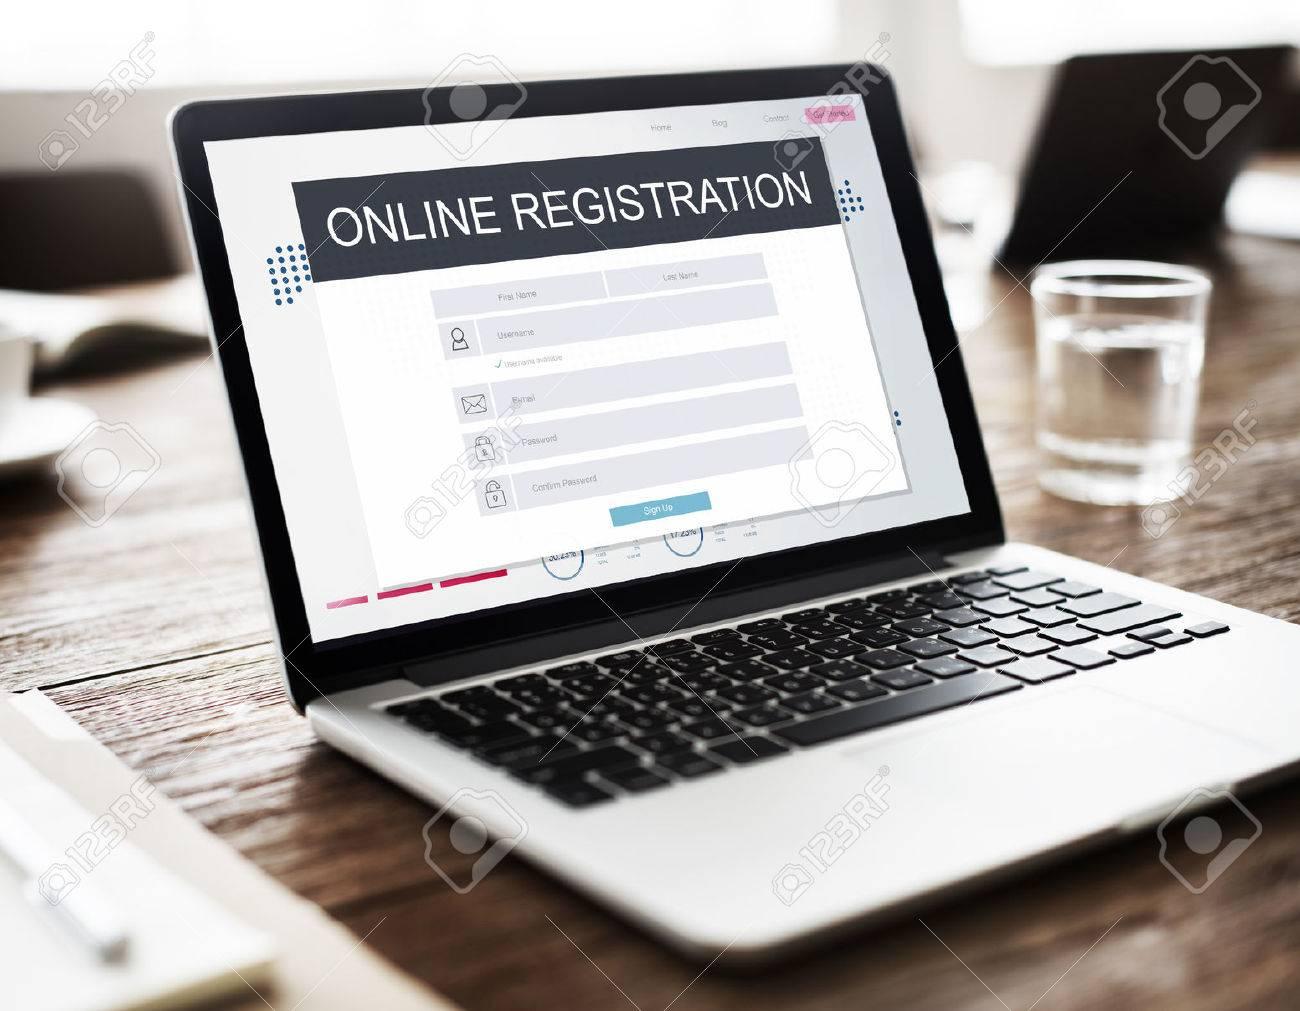 Online Registration Membership Follow Concept Standard-Bild - 61390843